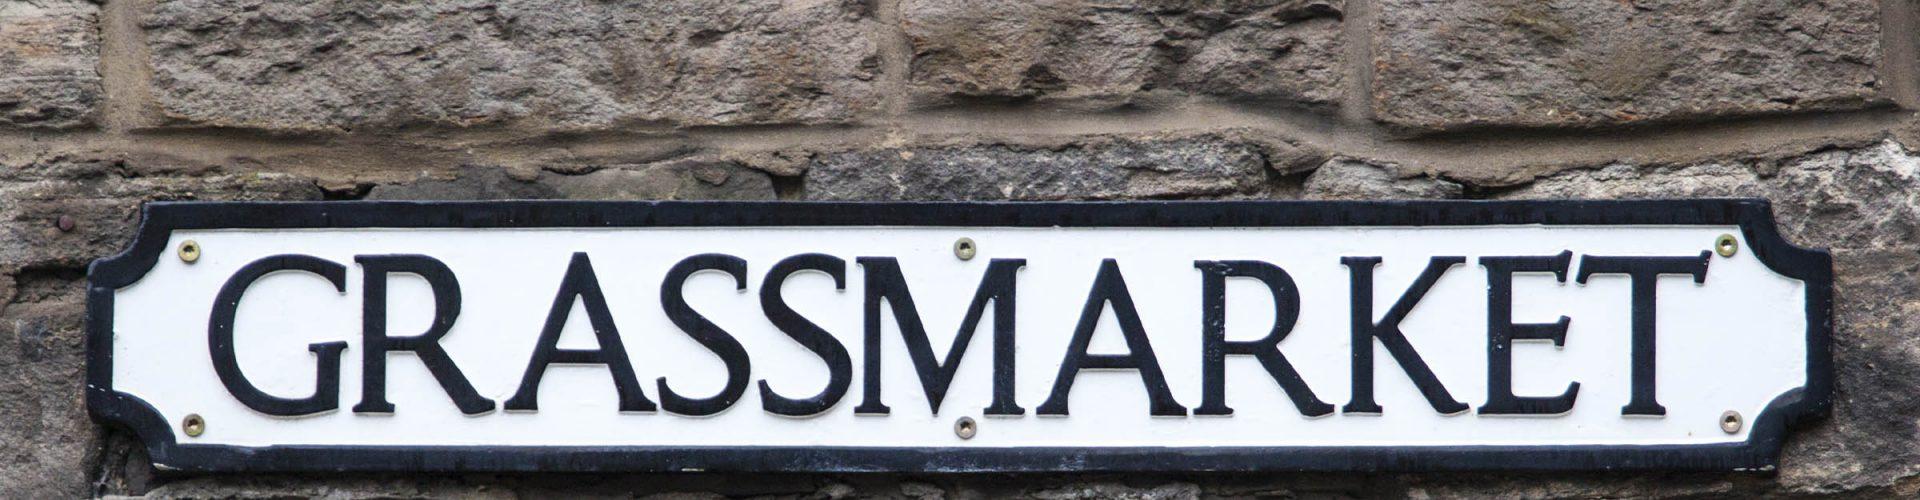 A sign for the Grassmarket in Edinburgh